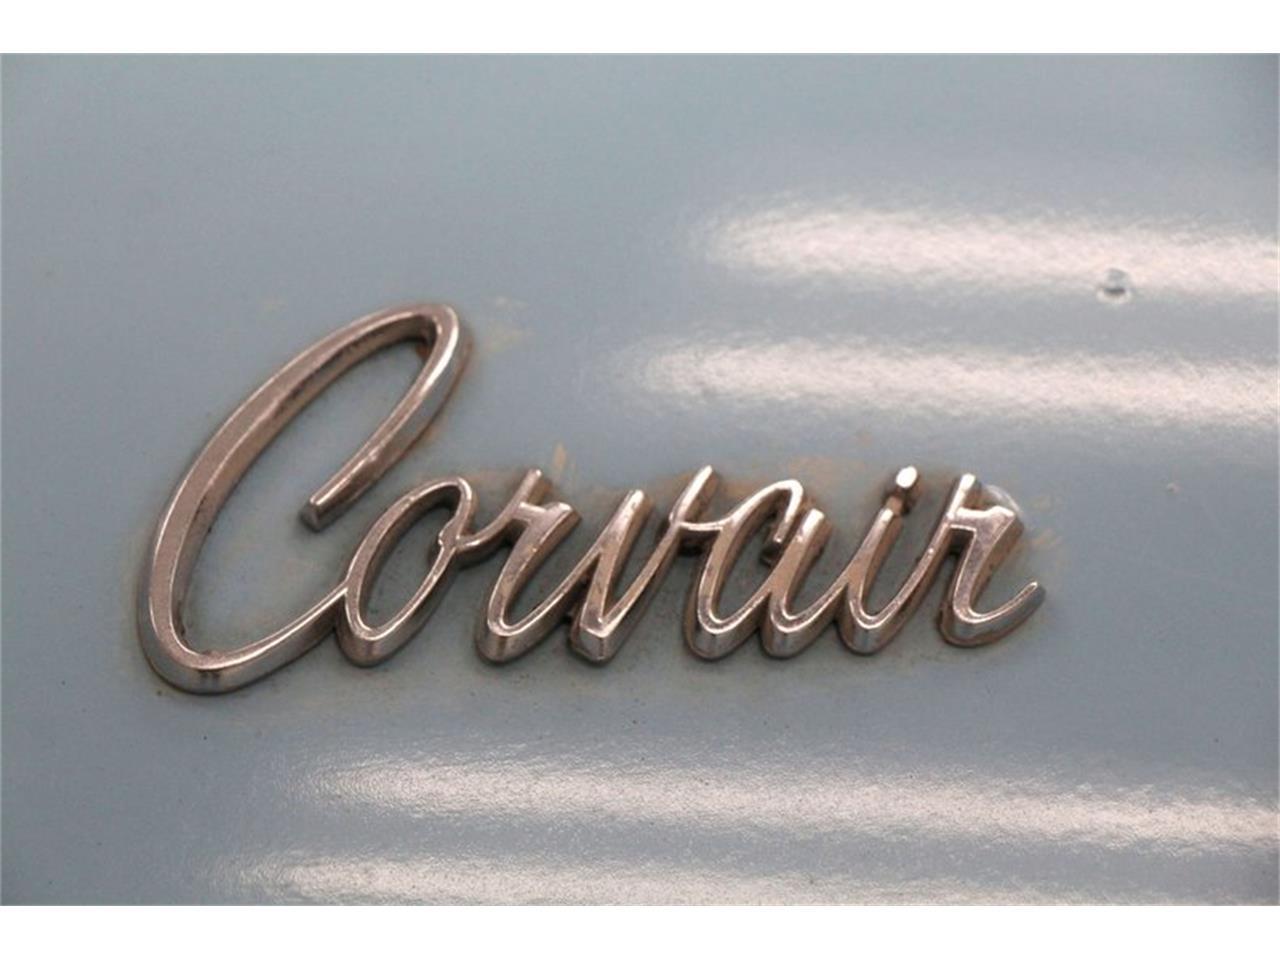 1965 Chevrolet Corvair (CC-1374718) for sale in Morgantown, Pennsylvania